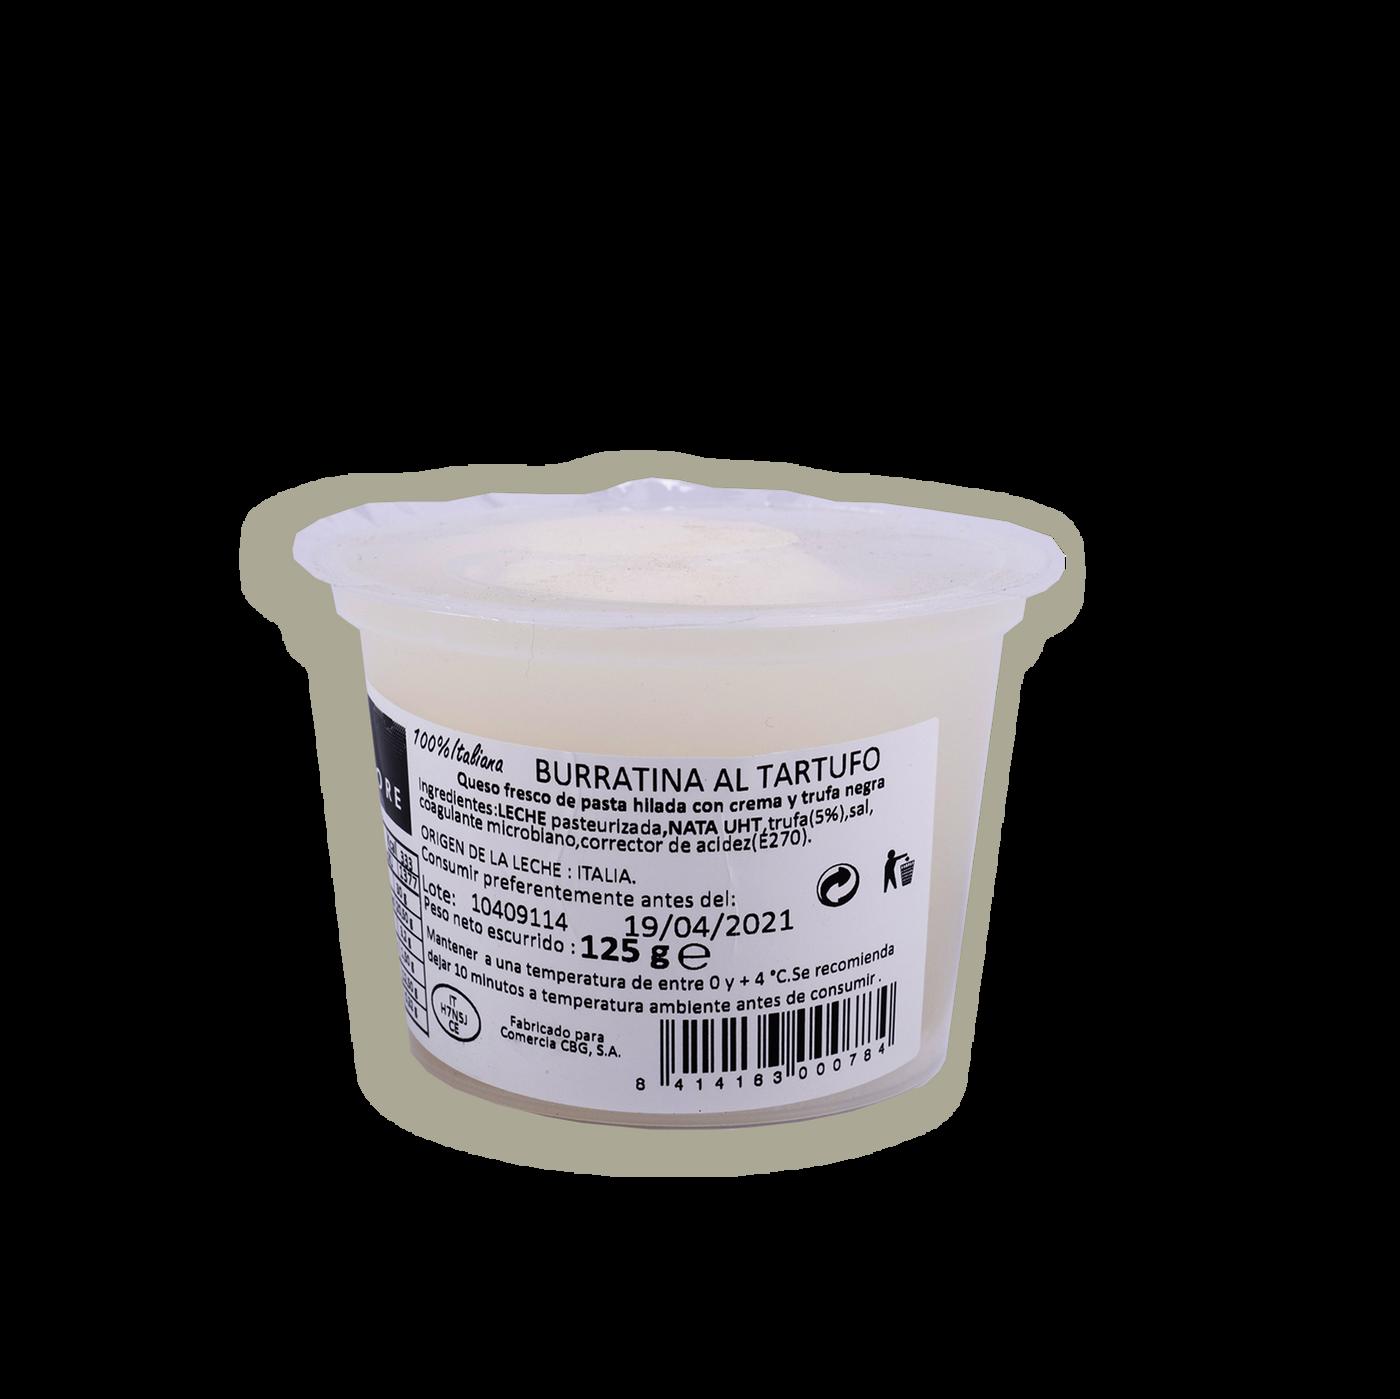 Burratina Aromatizzata Al Tartufo S/testa